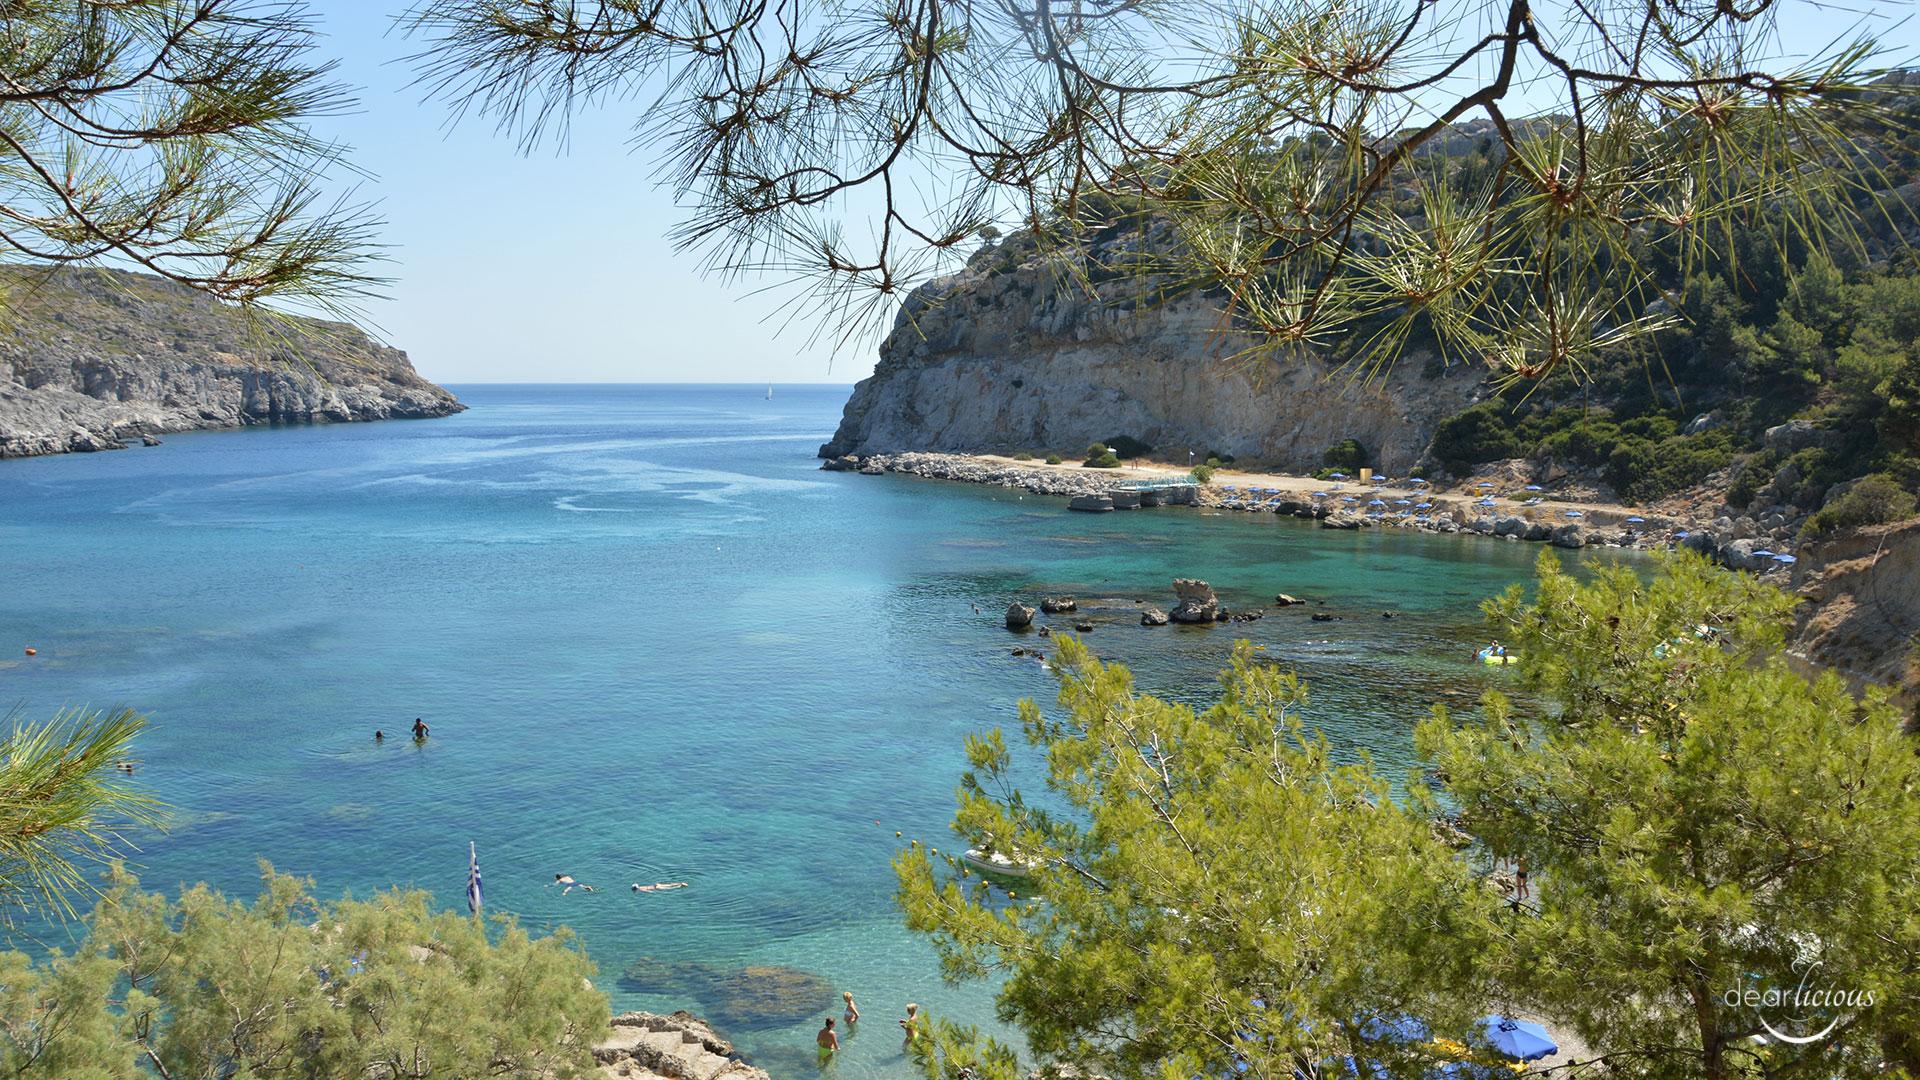 Food Travel | Kurzurlaub auf Rhodos | www.dearlicious.com